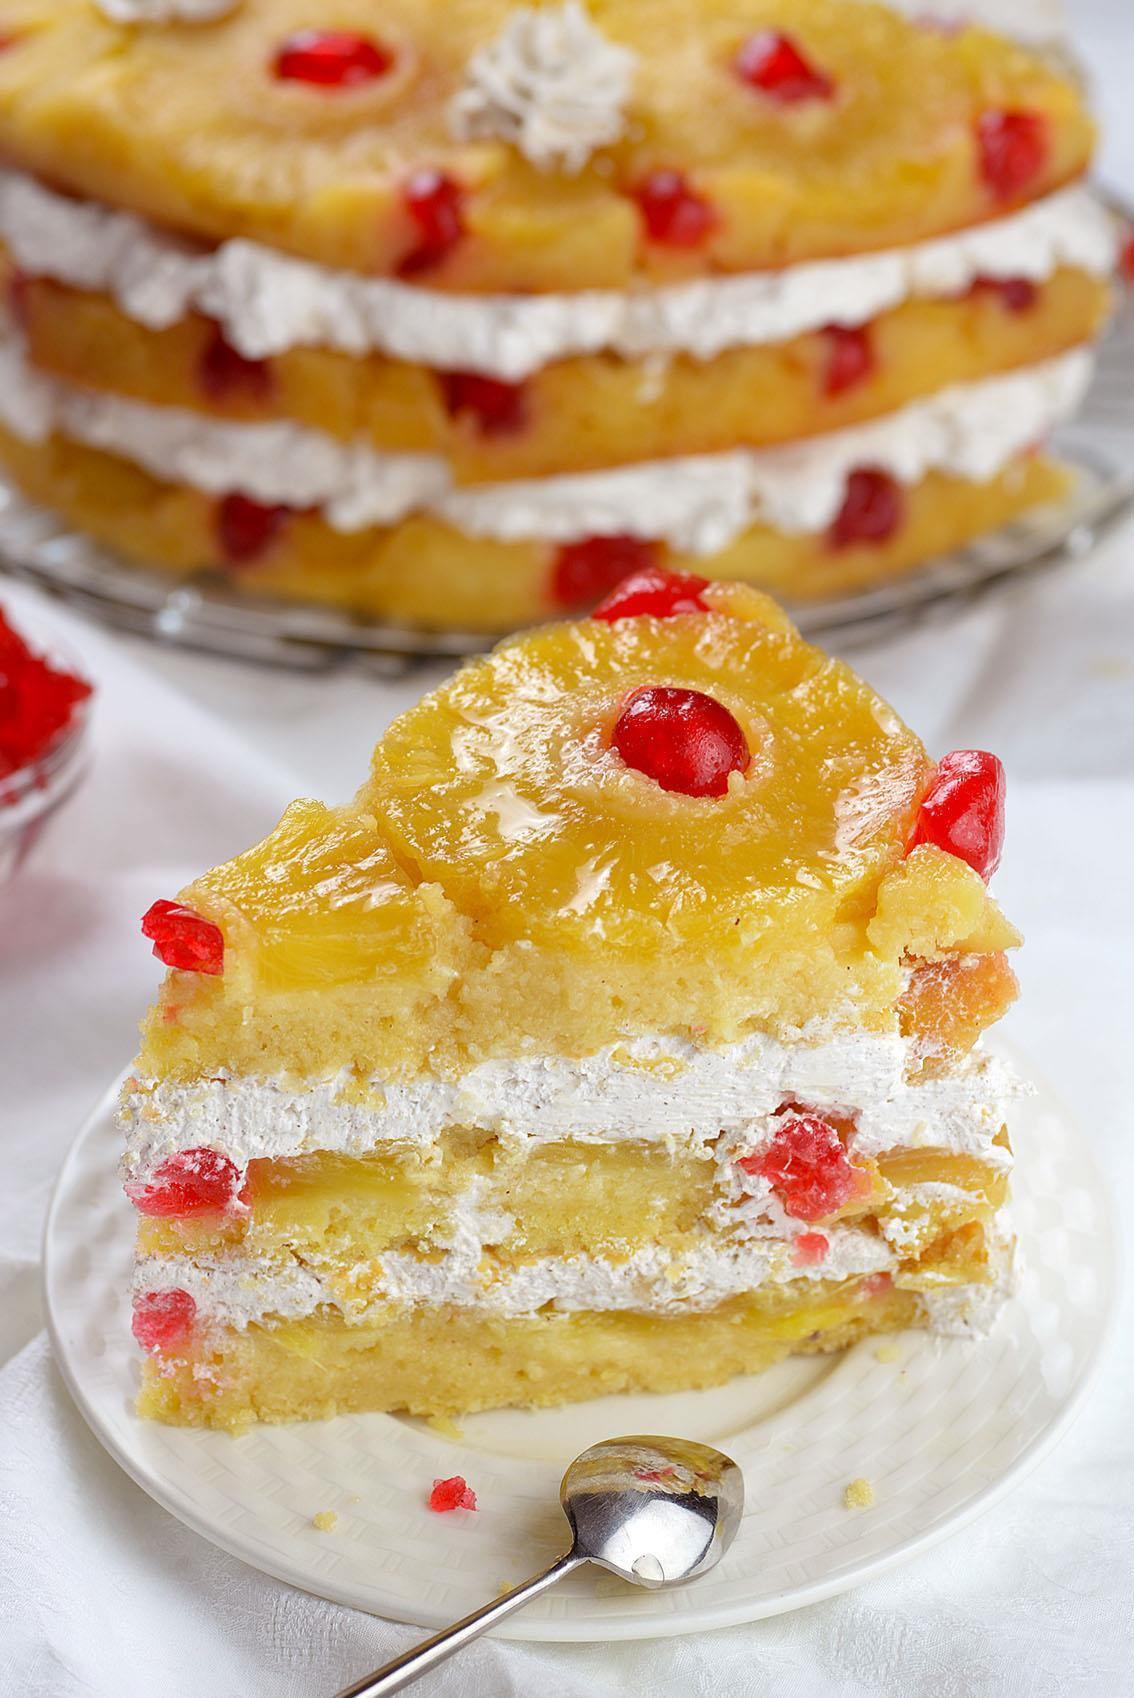 Pineapple Upside Down Cake Recipes  Pineapple Upside Down Cake